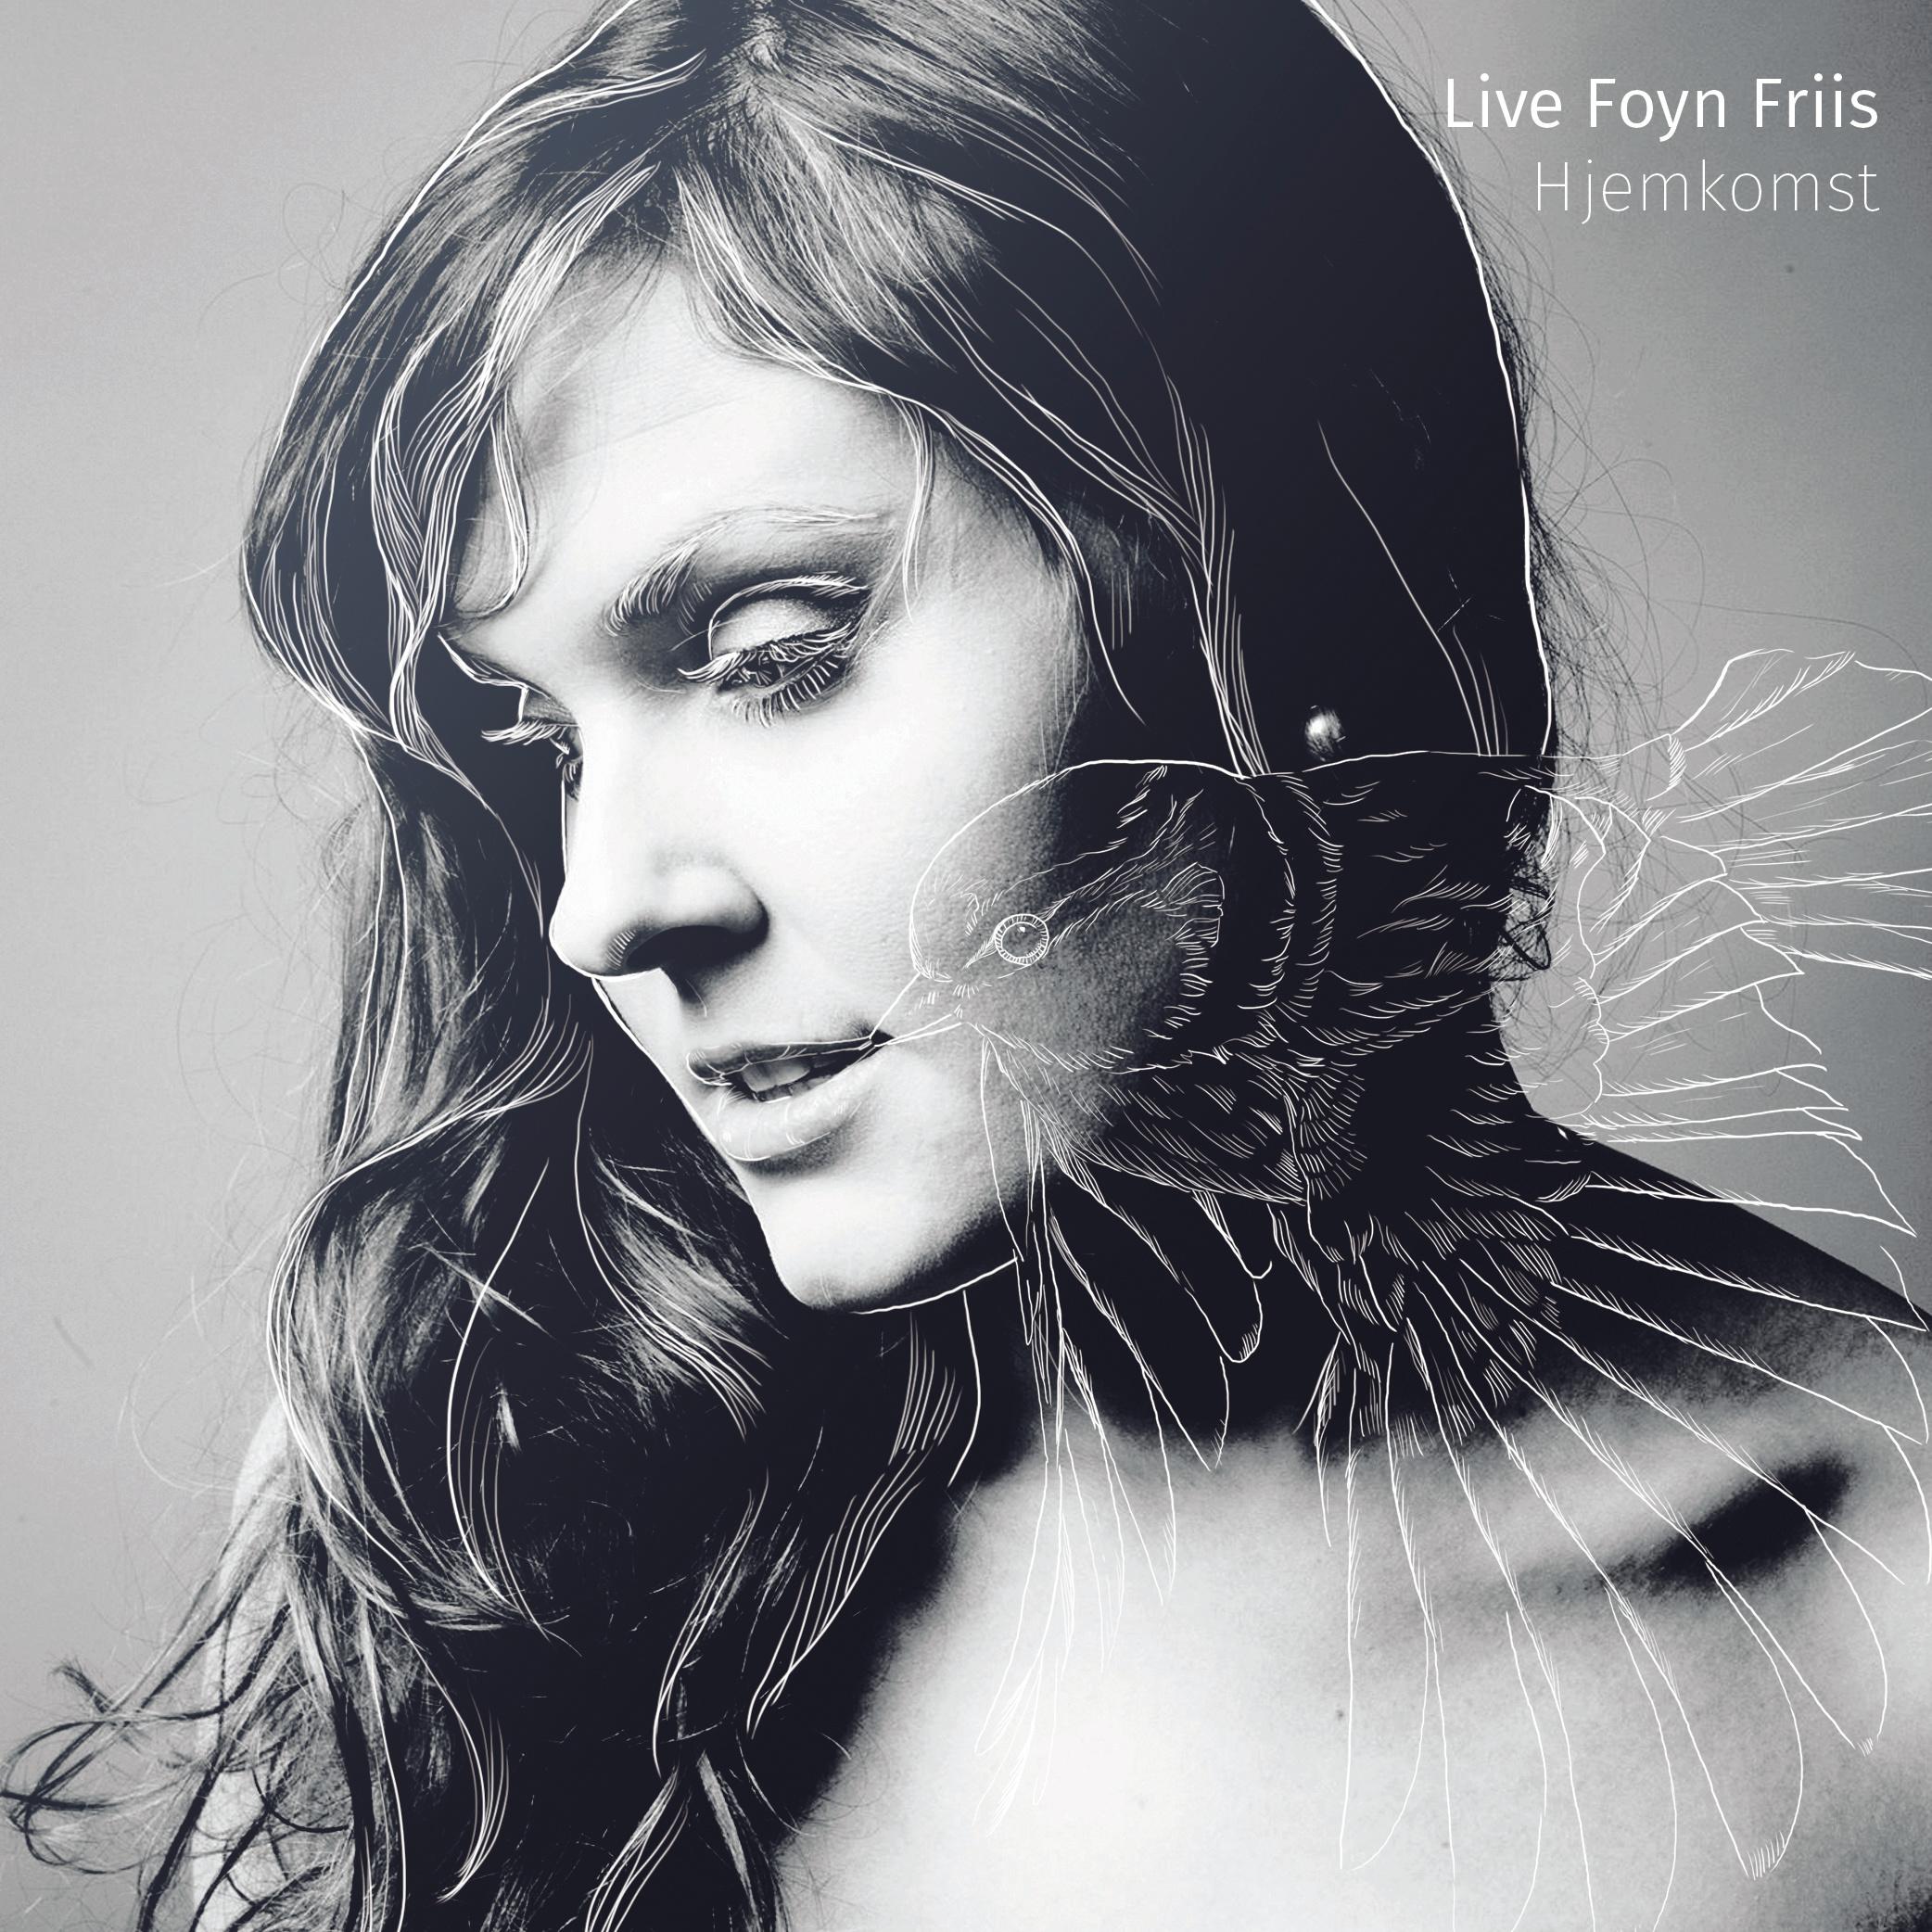 Cover art for Live Foyn Friis